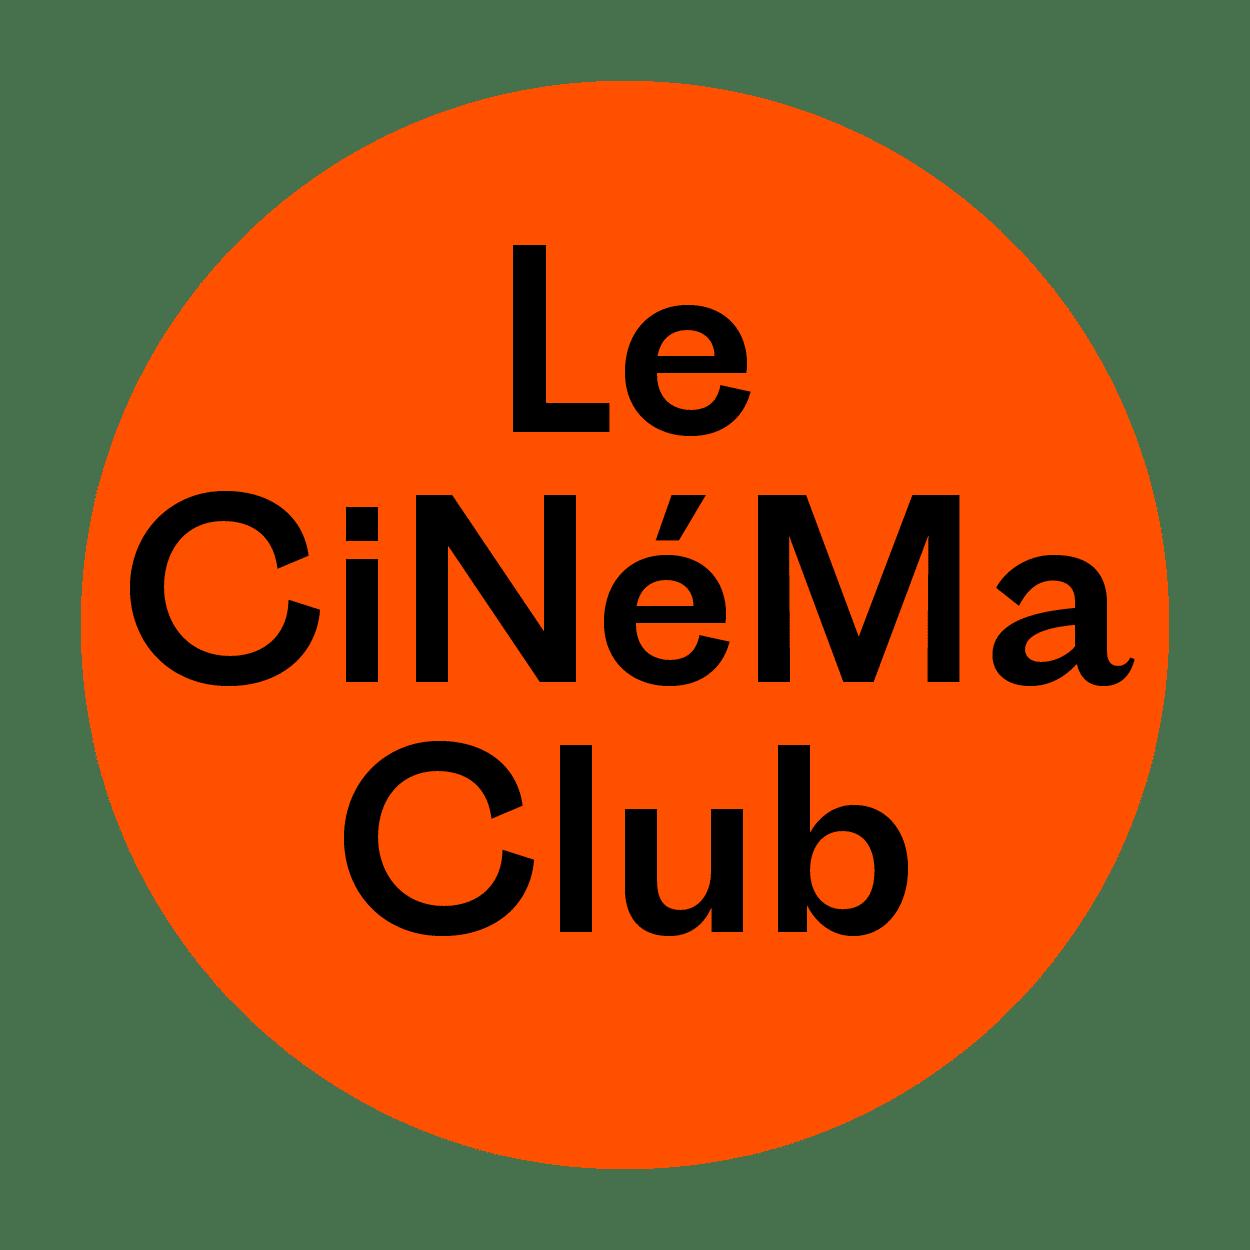 Le cinema club